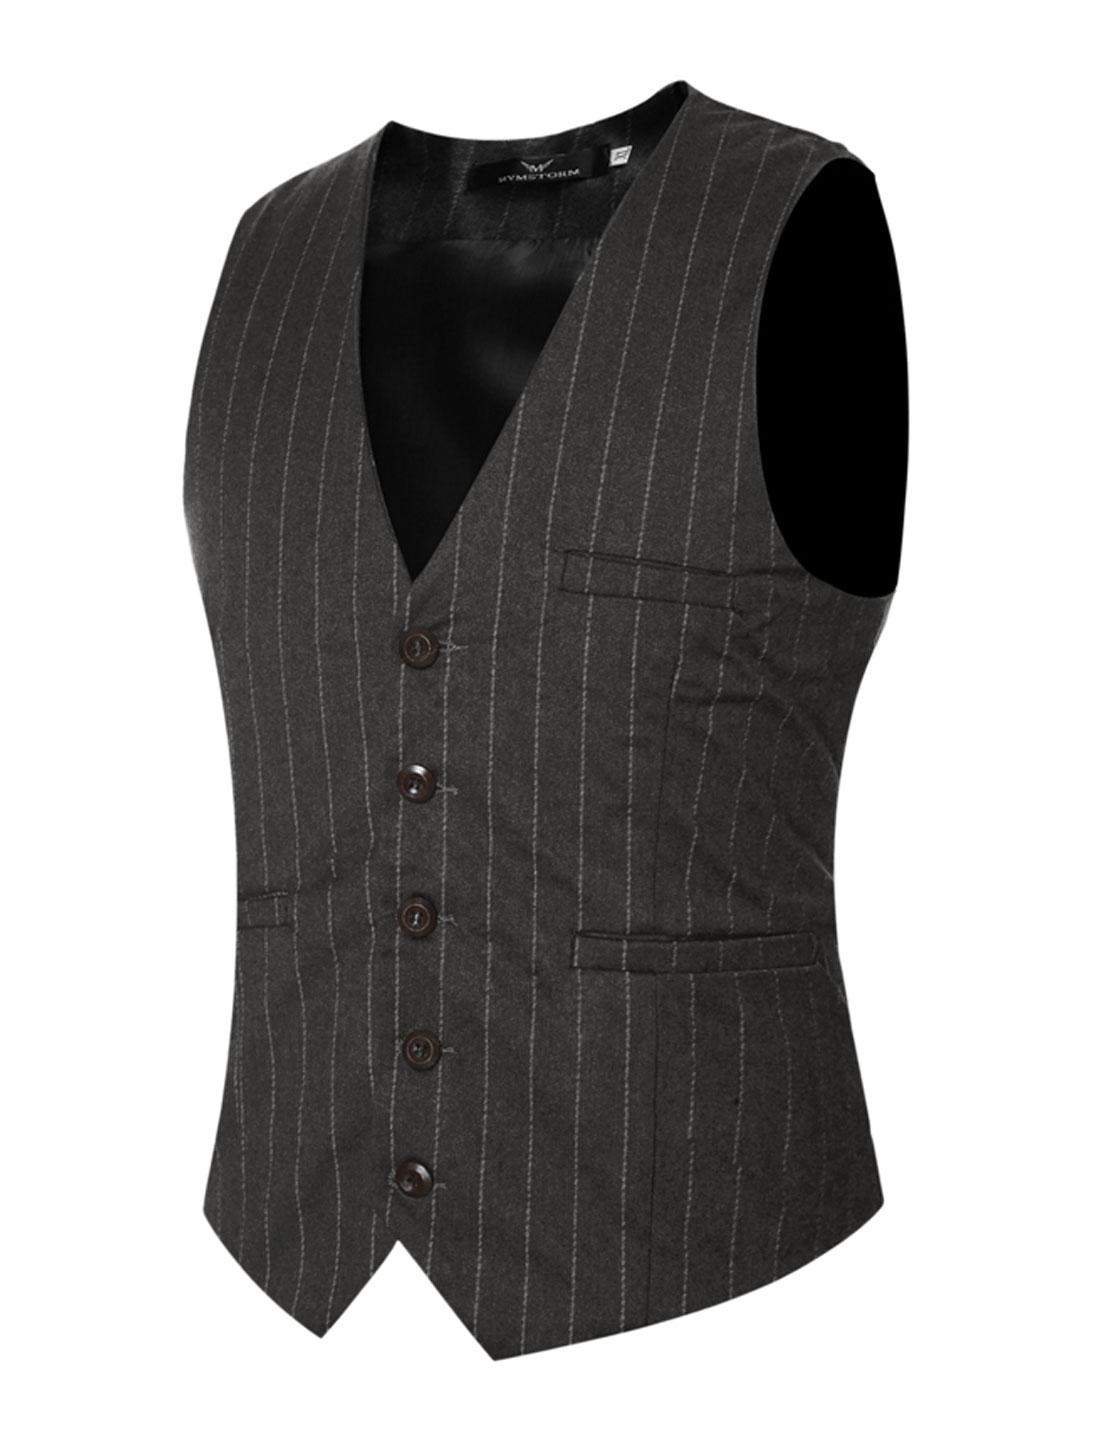 Men Adjustable Self Tie Slim Fit V Neck Button Up Striped Waistcoat Gray S